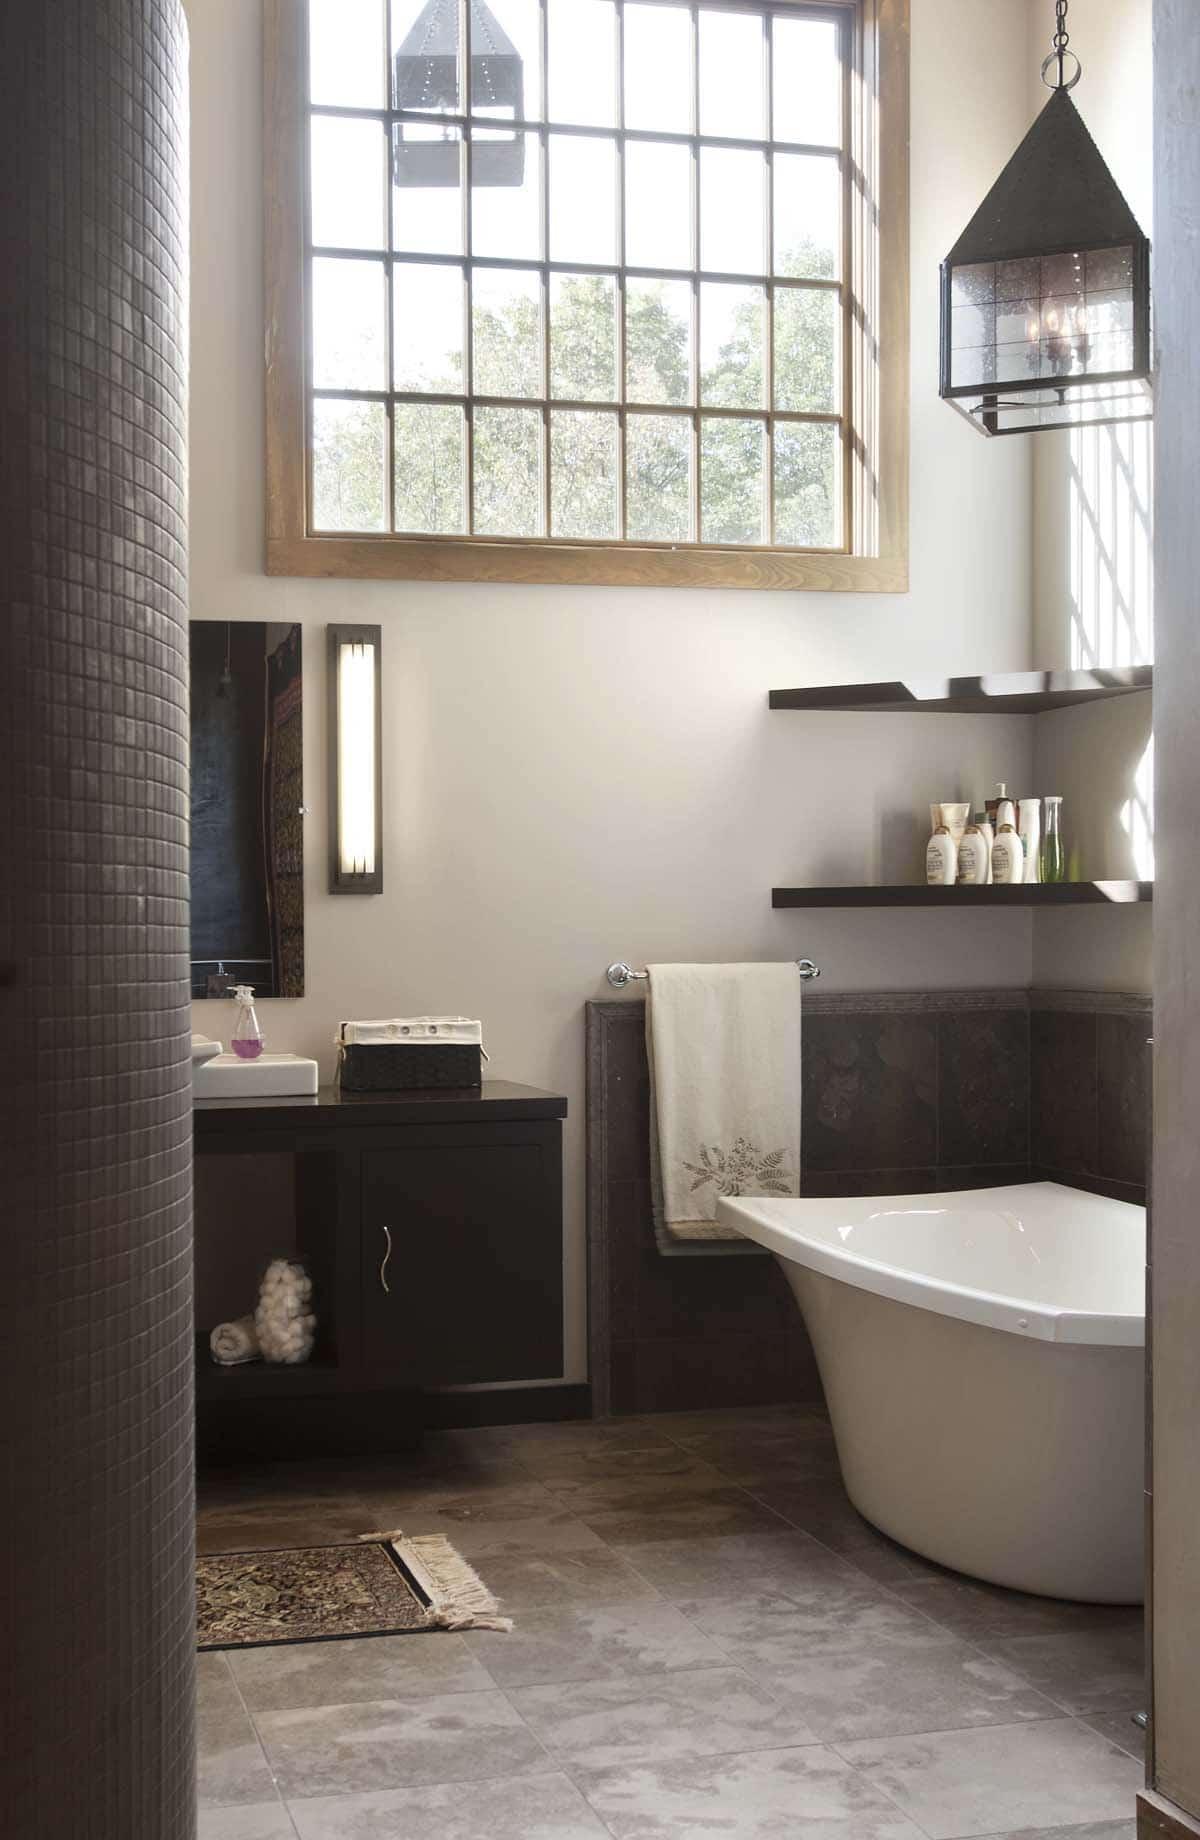 Rustic Bathroom Freestanding Tub Top Kat Photo